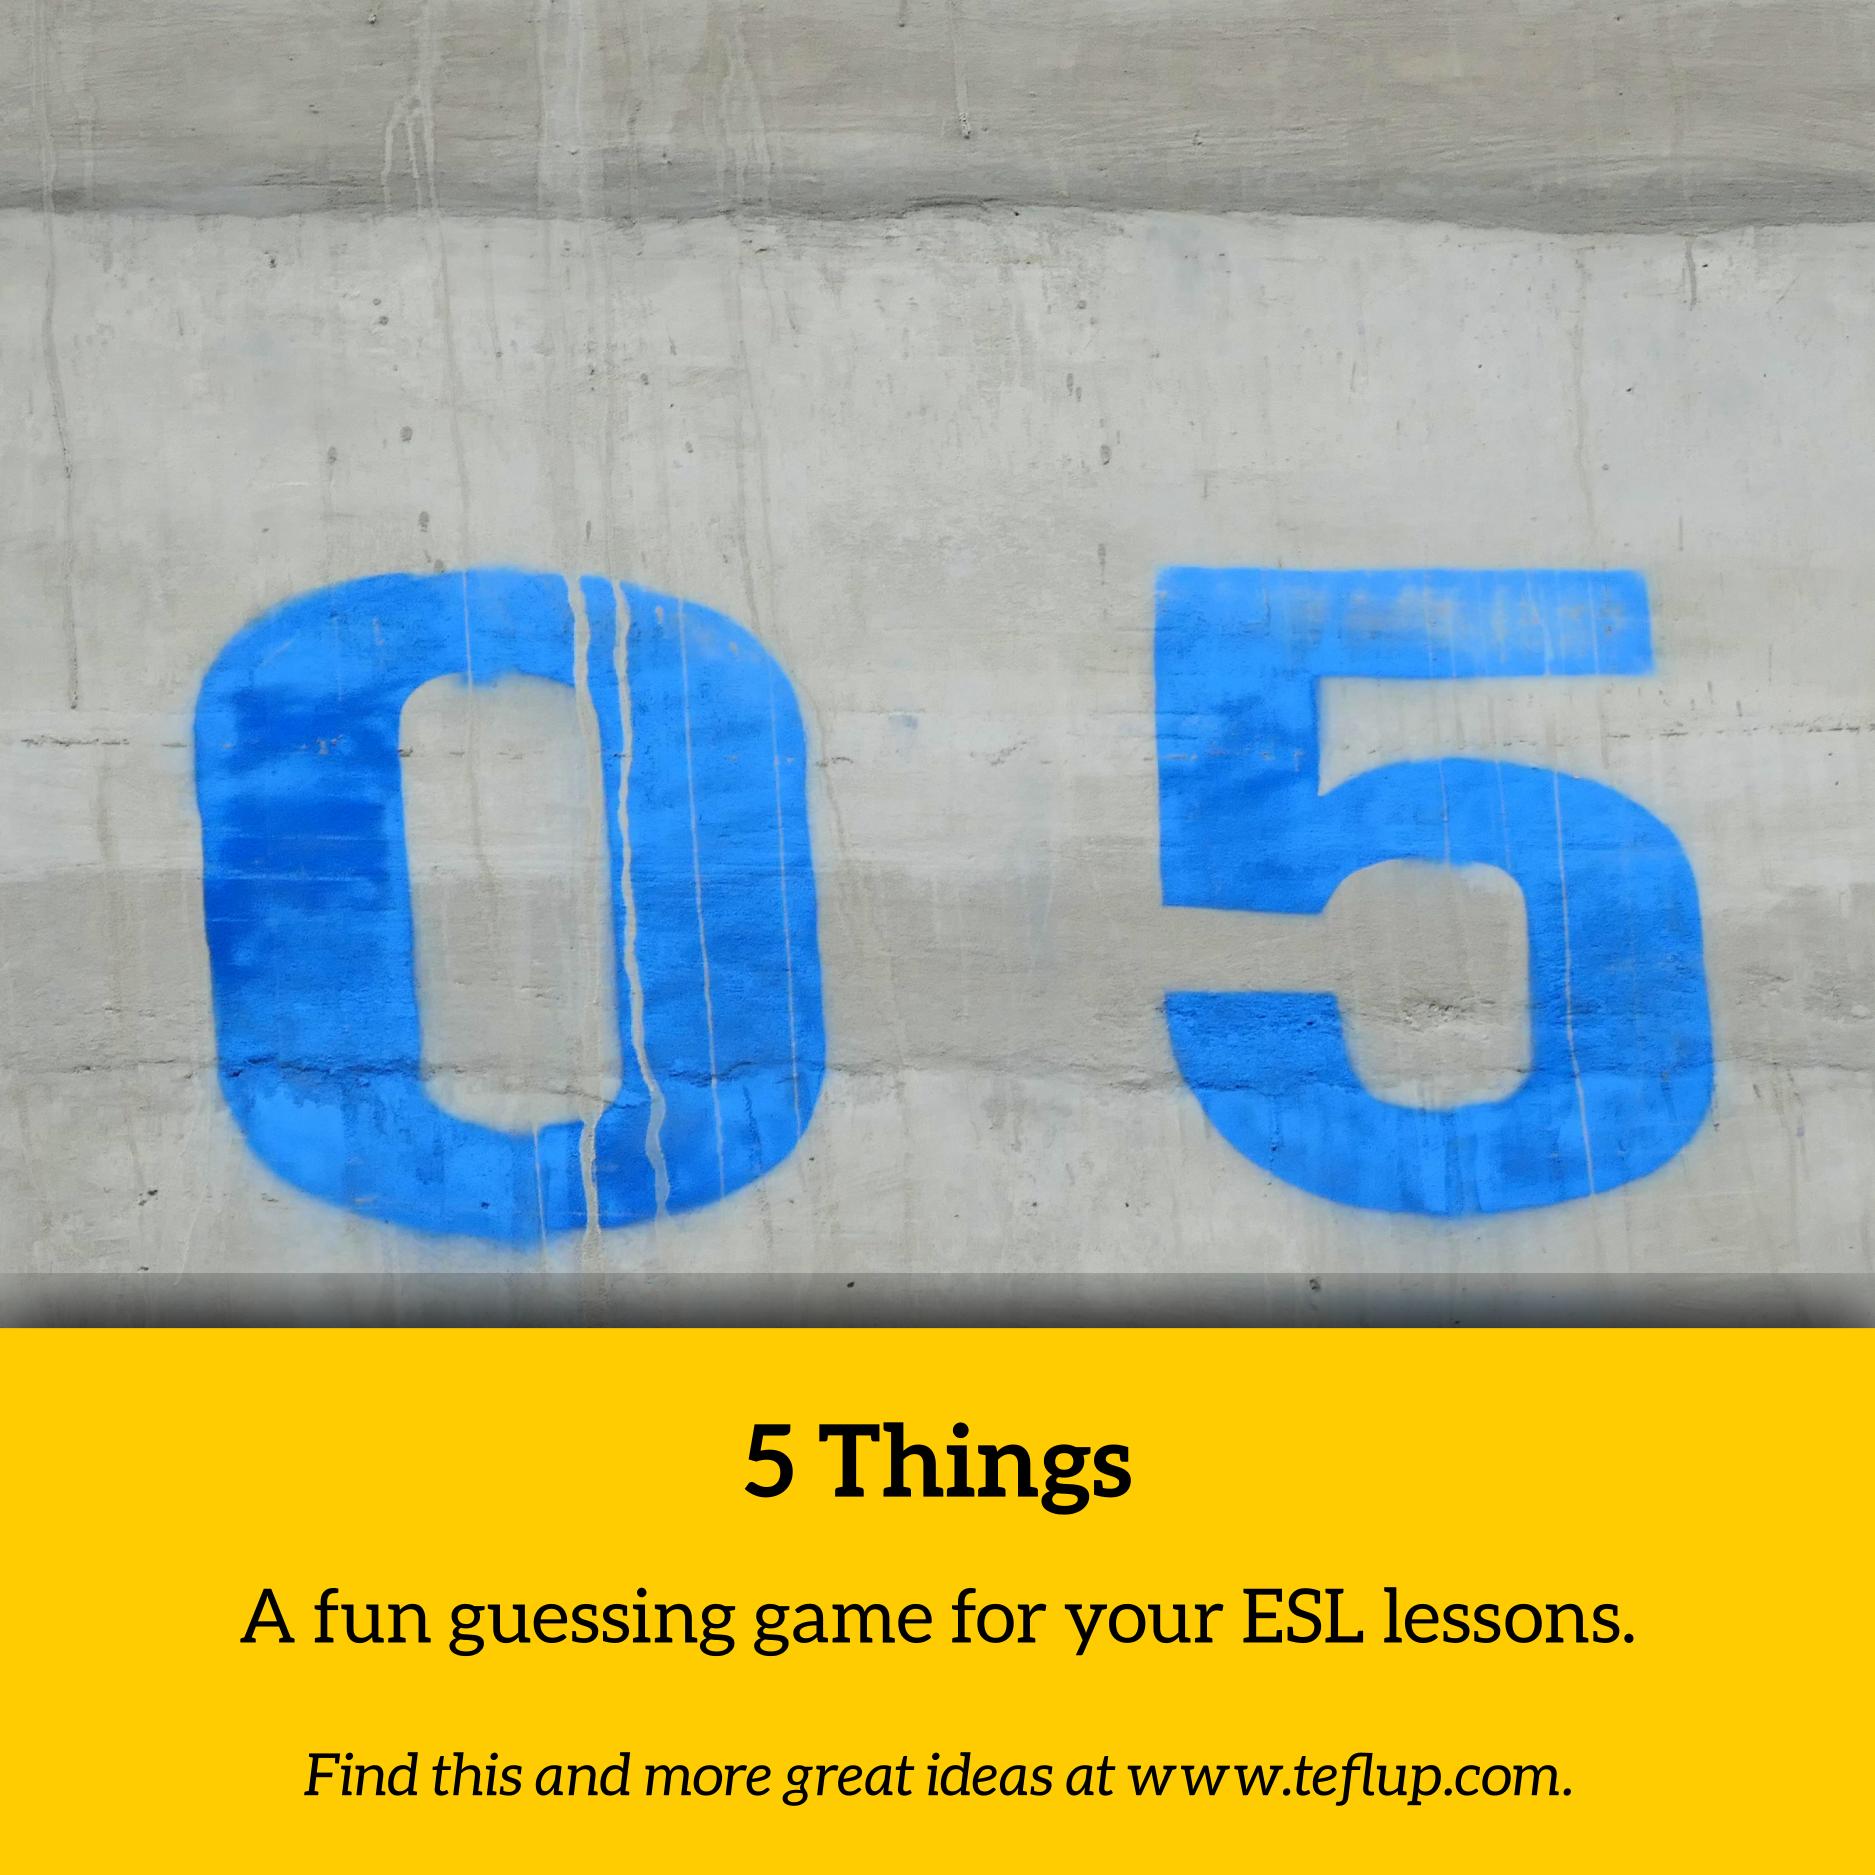 5 things game